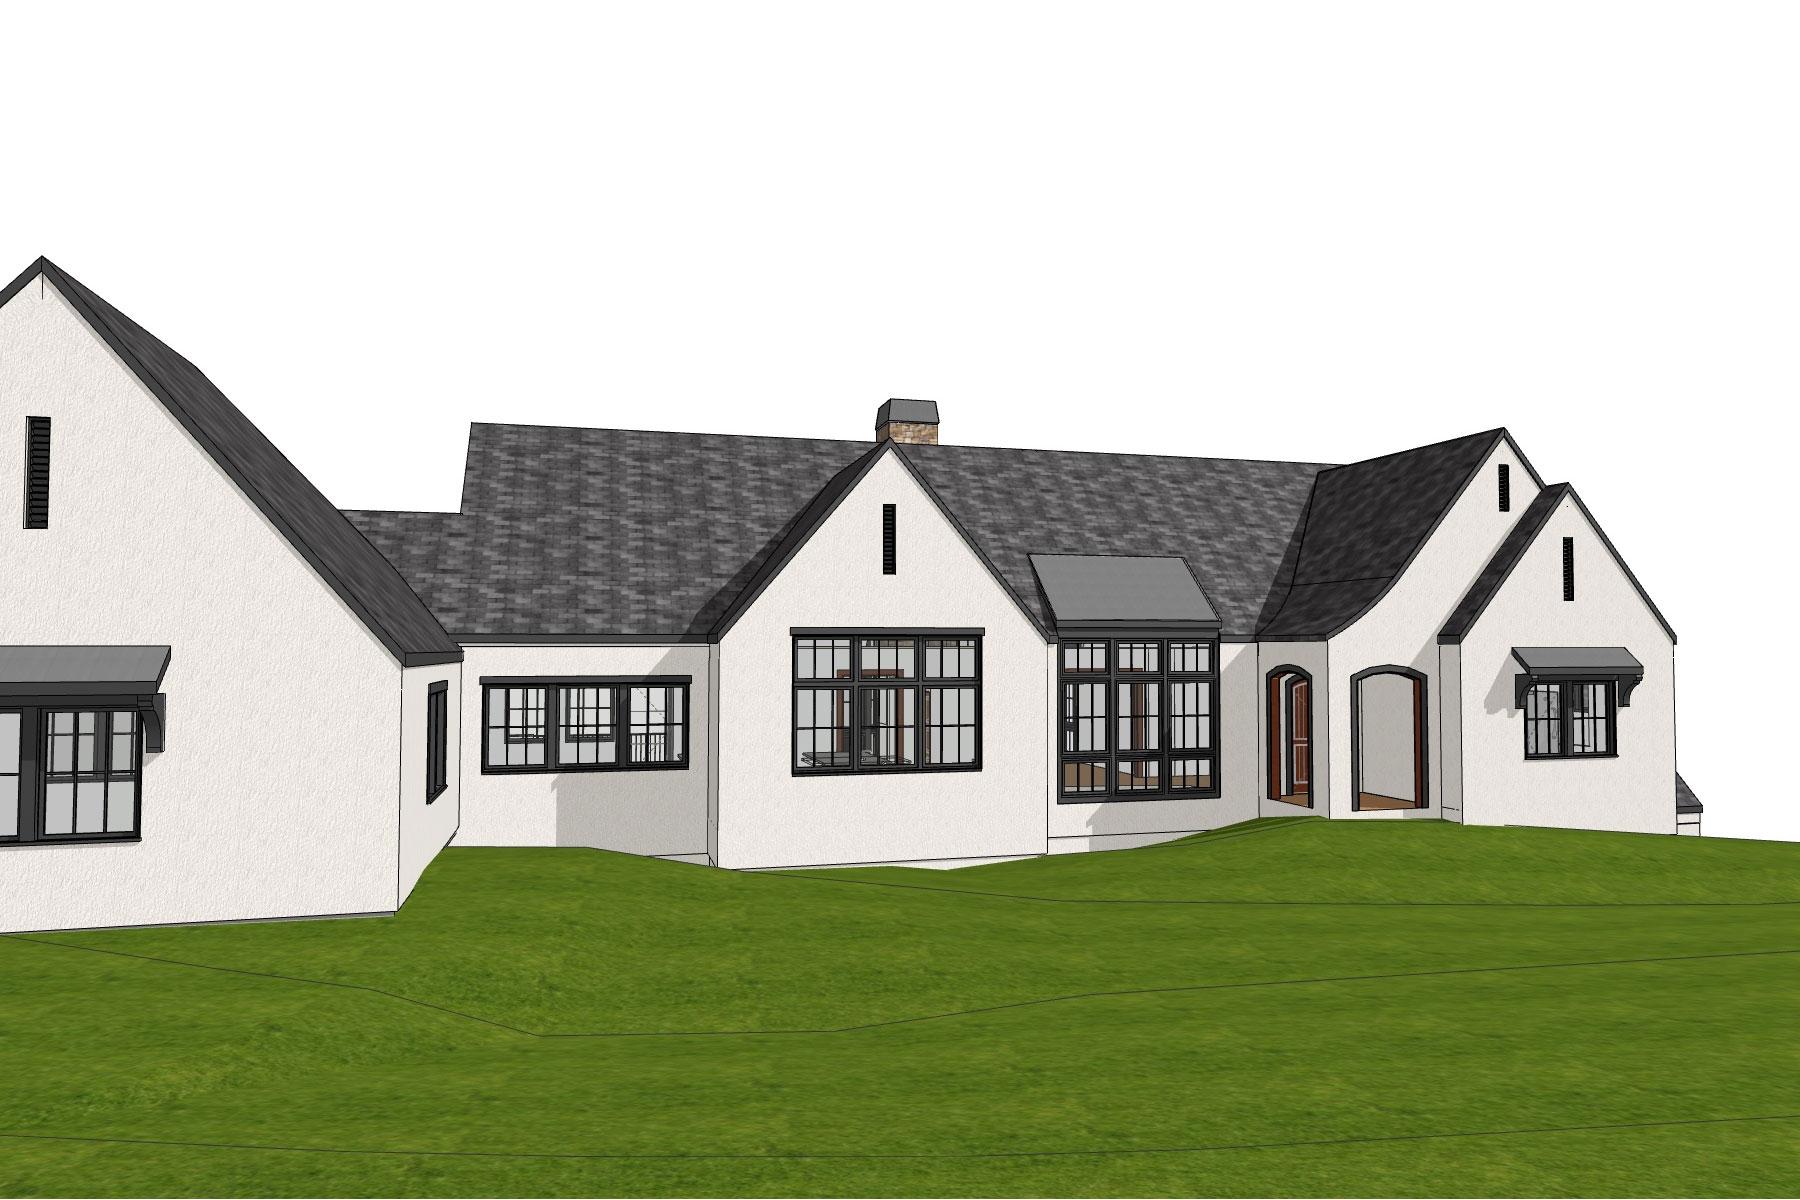 front-elevation-rendering-m